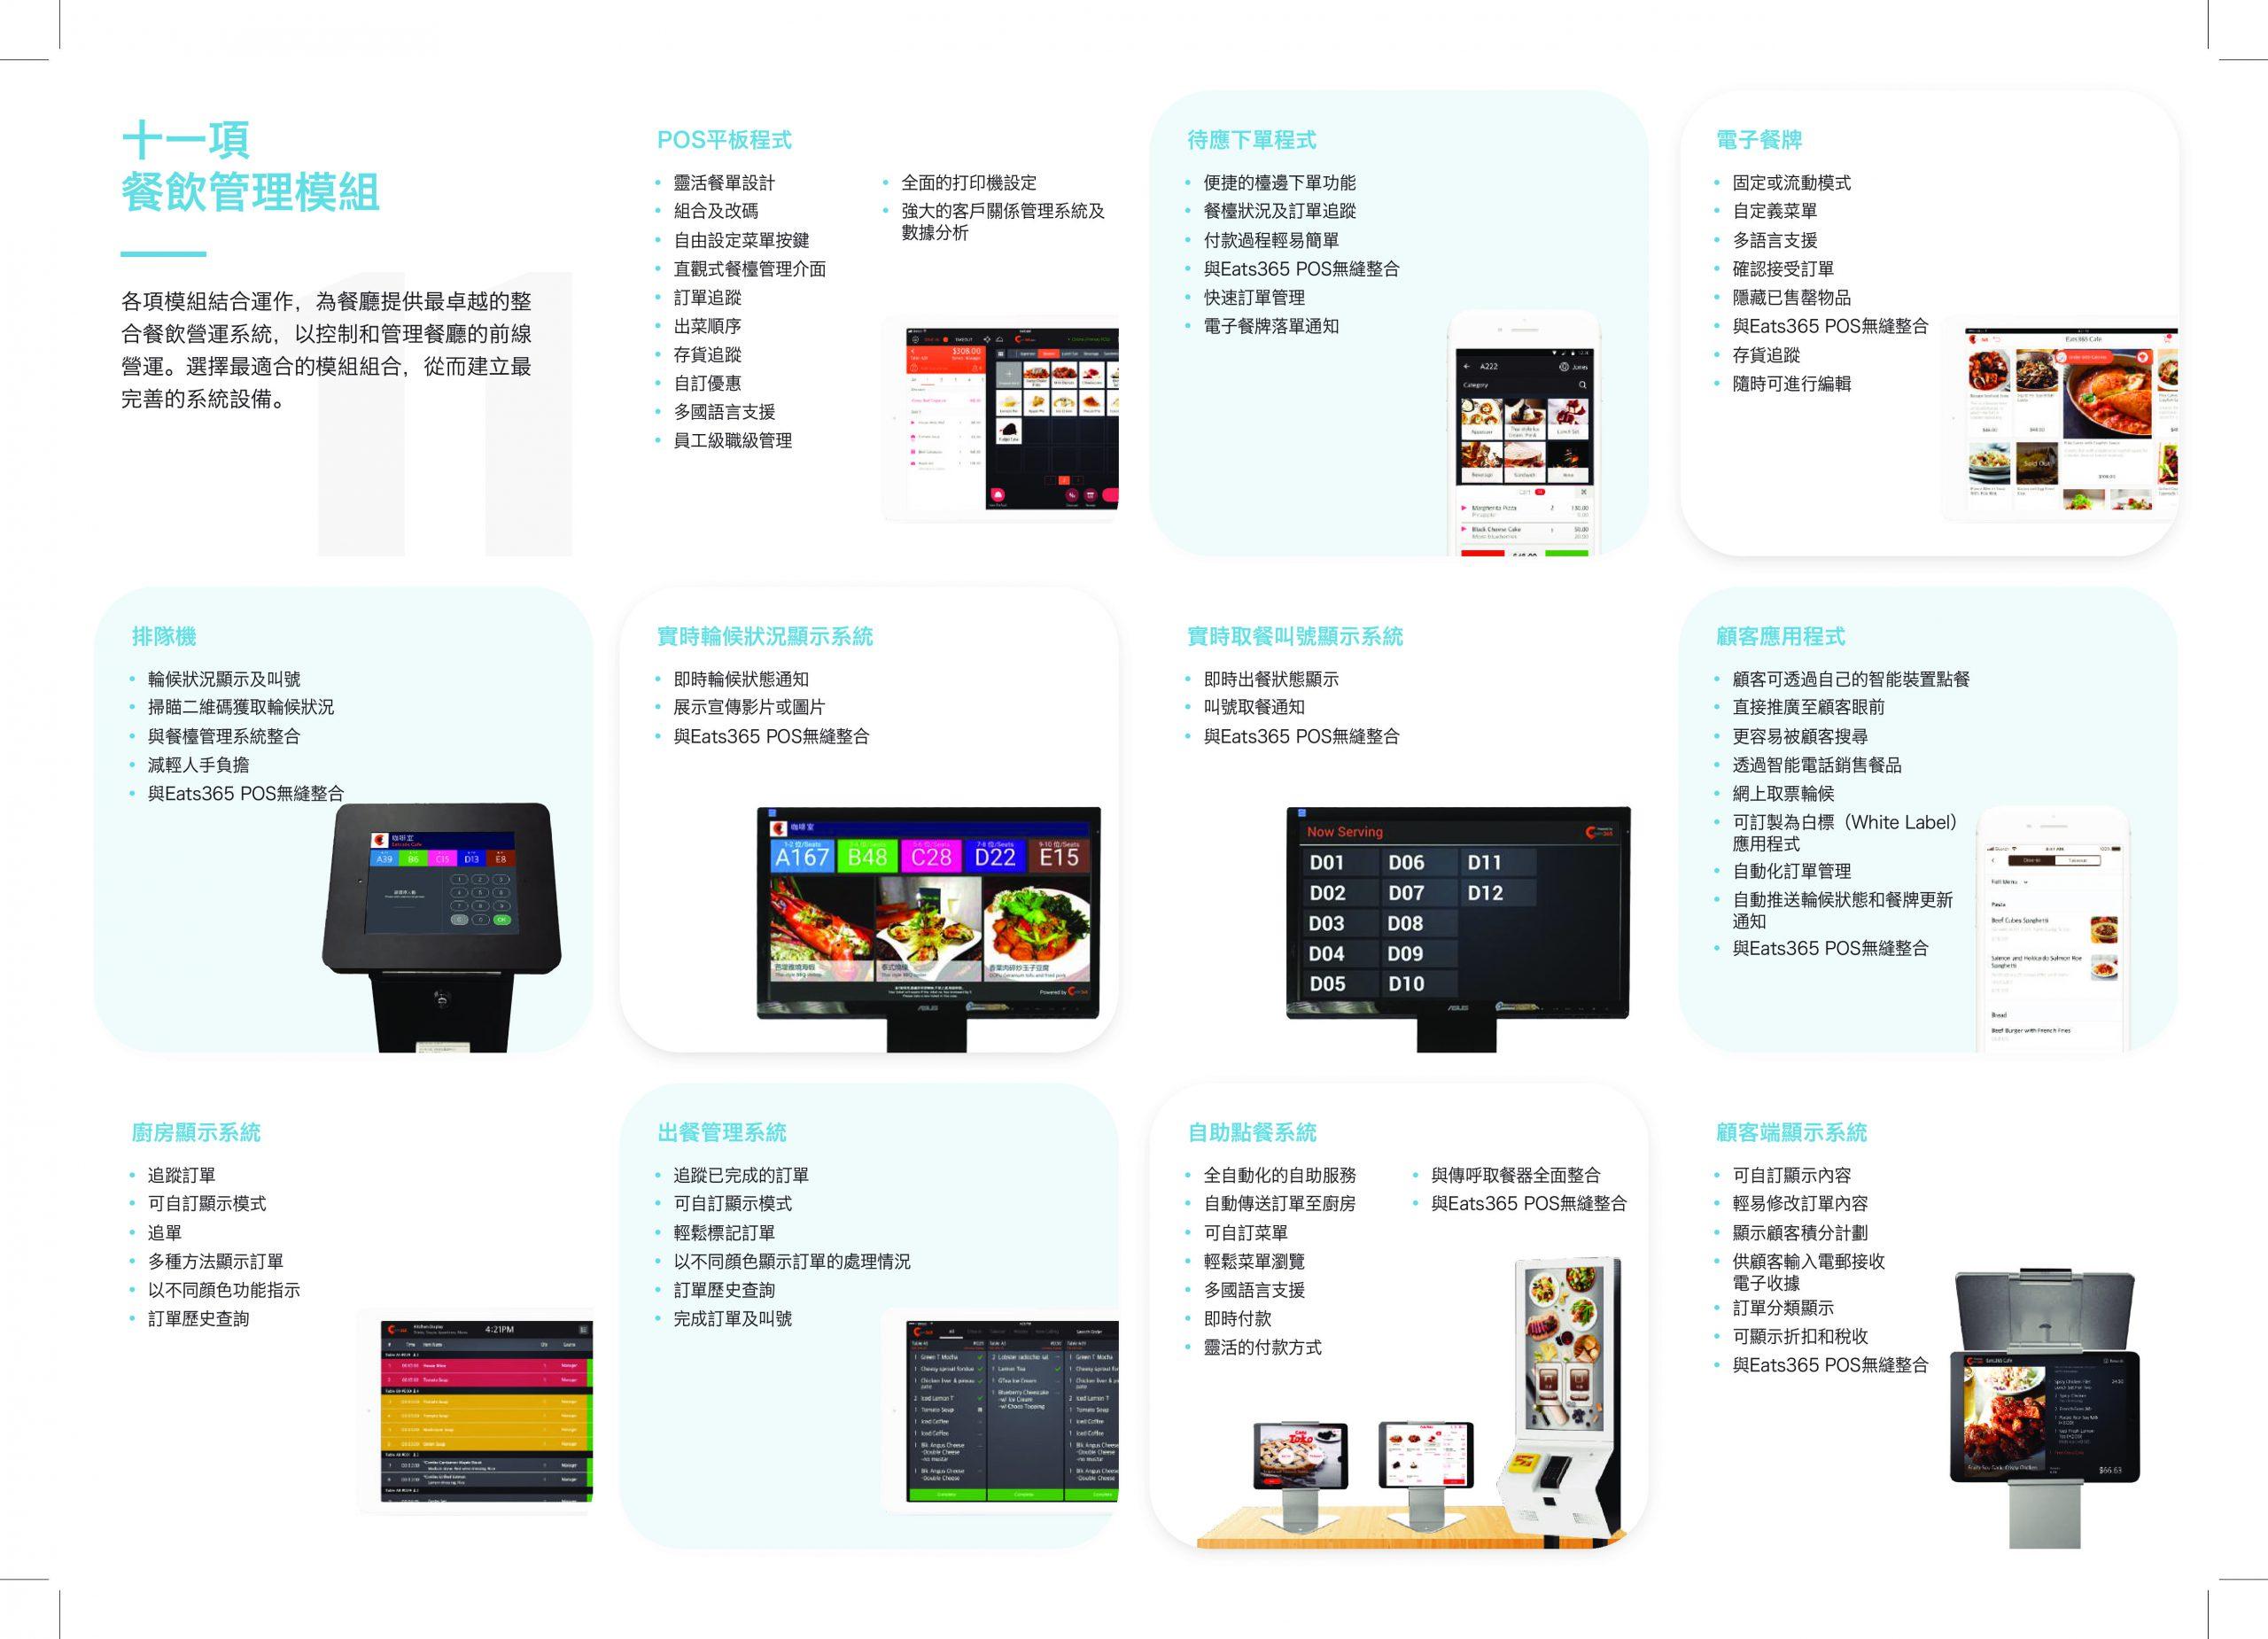 Eats365雲端餐飲管理系統